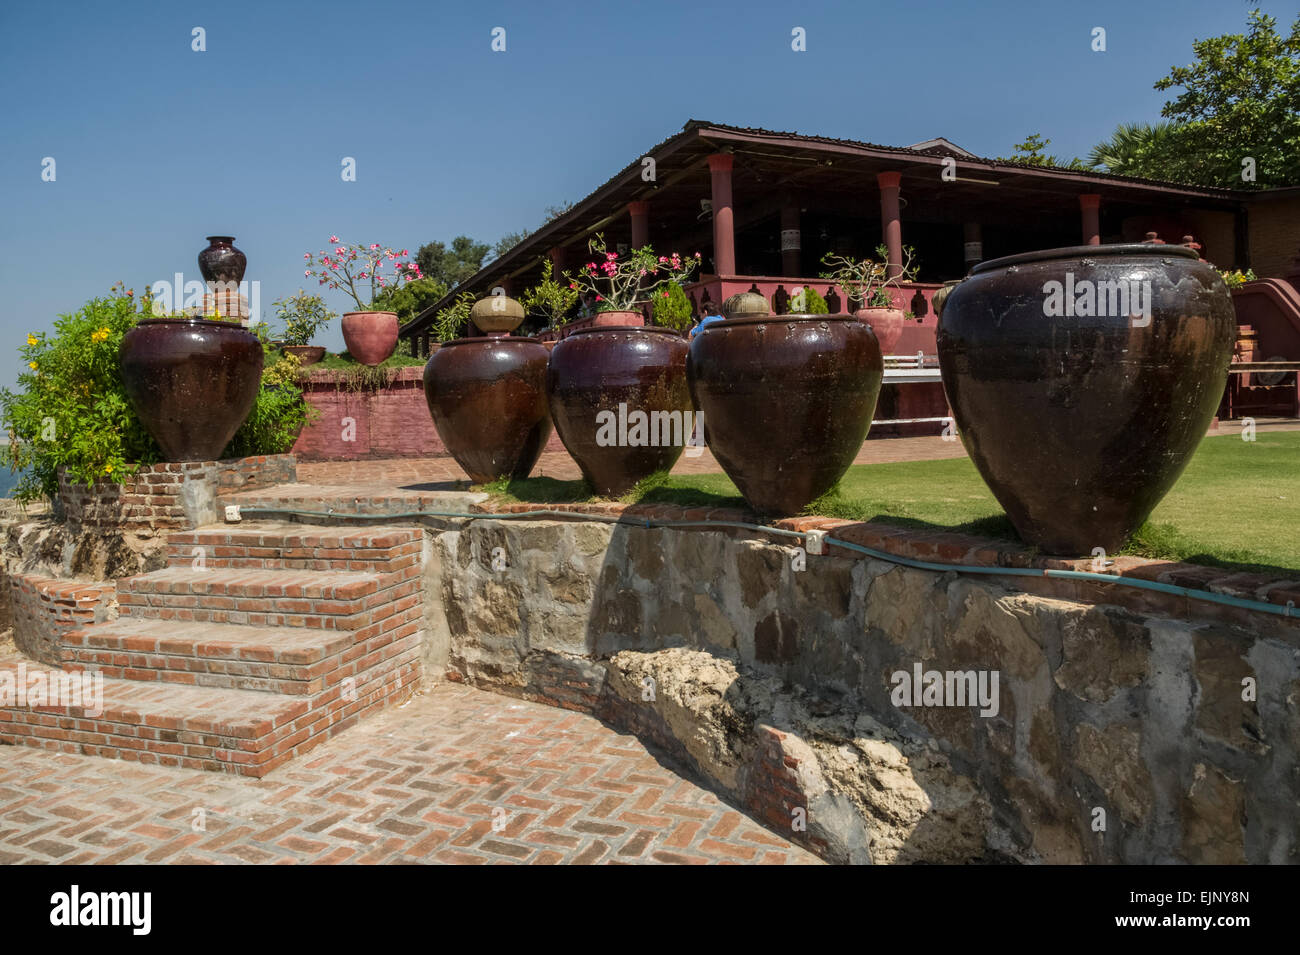 Pots, water storage jars - Stock Image